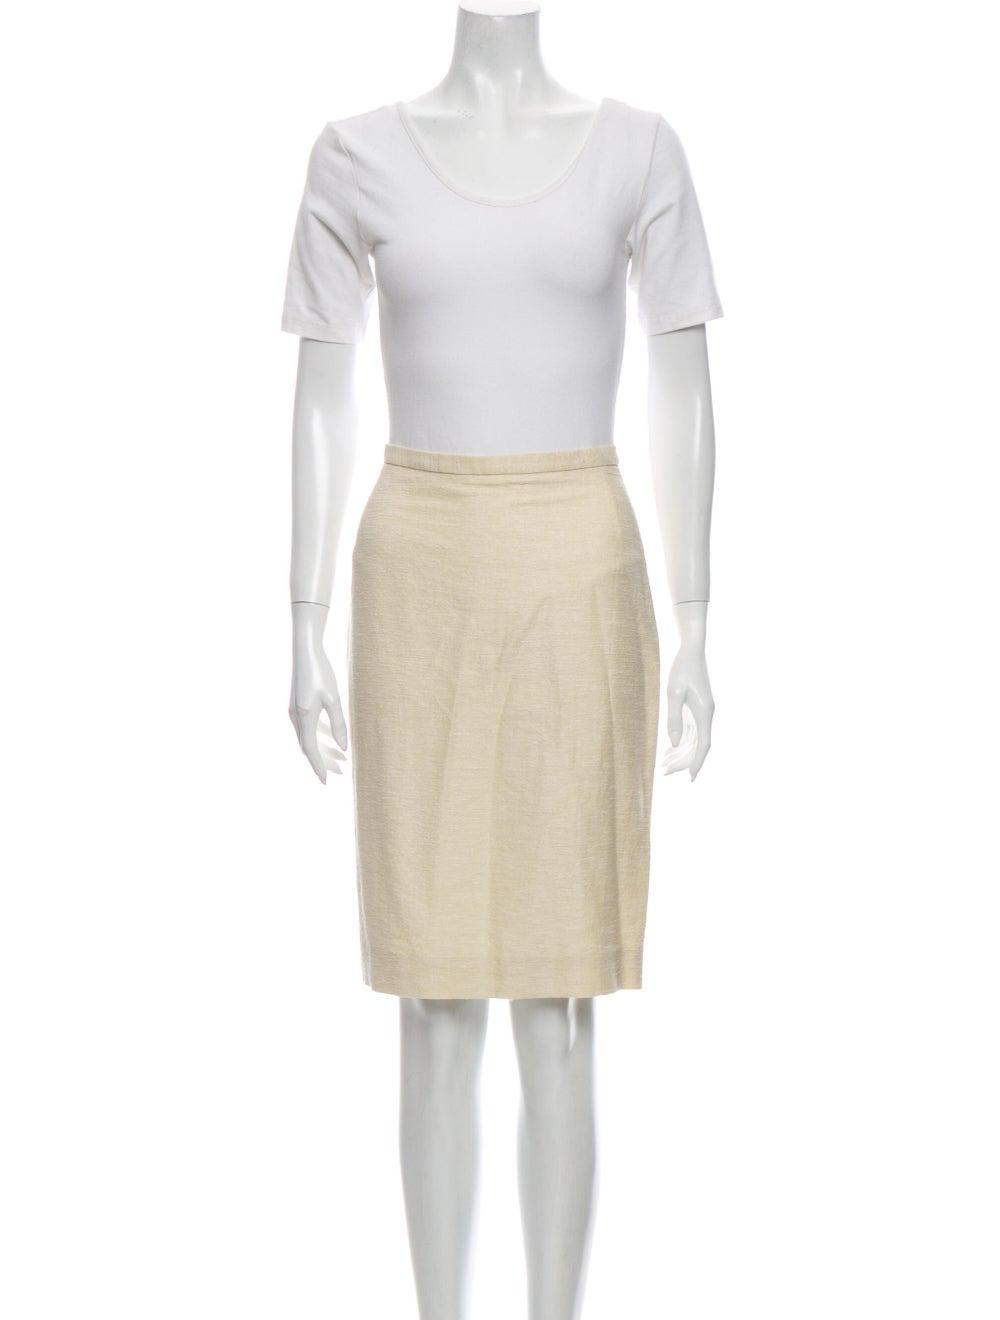 Dolce & Gabbana Linen Skirt Suit - image 4